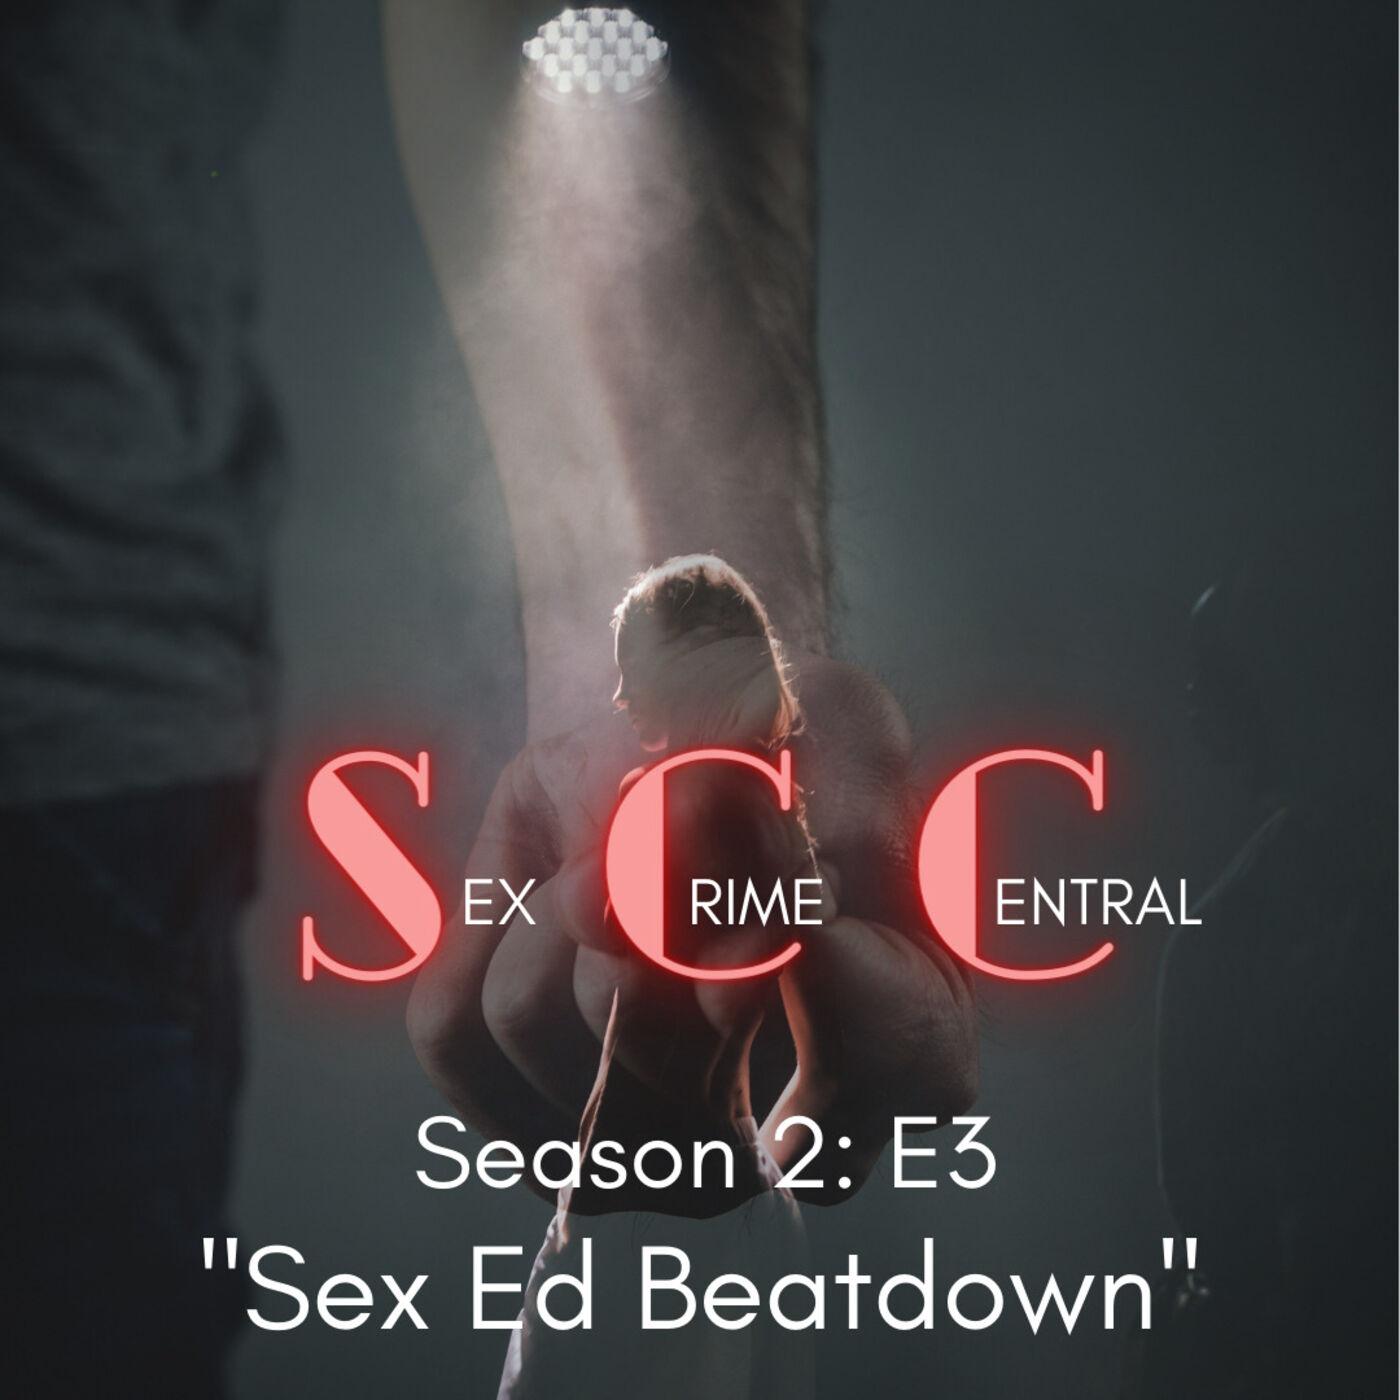 Sex Ed Beatdown